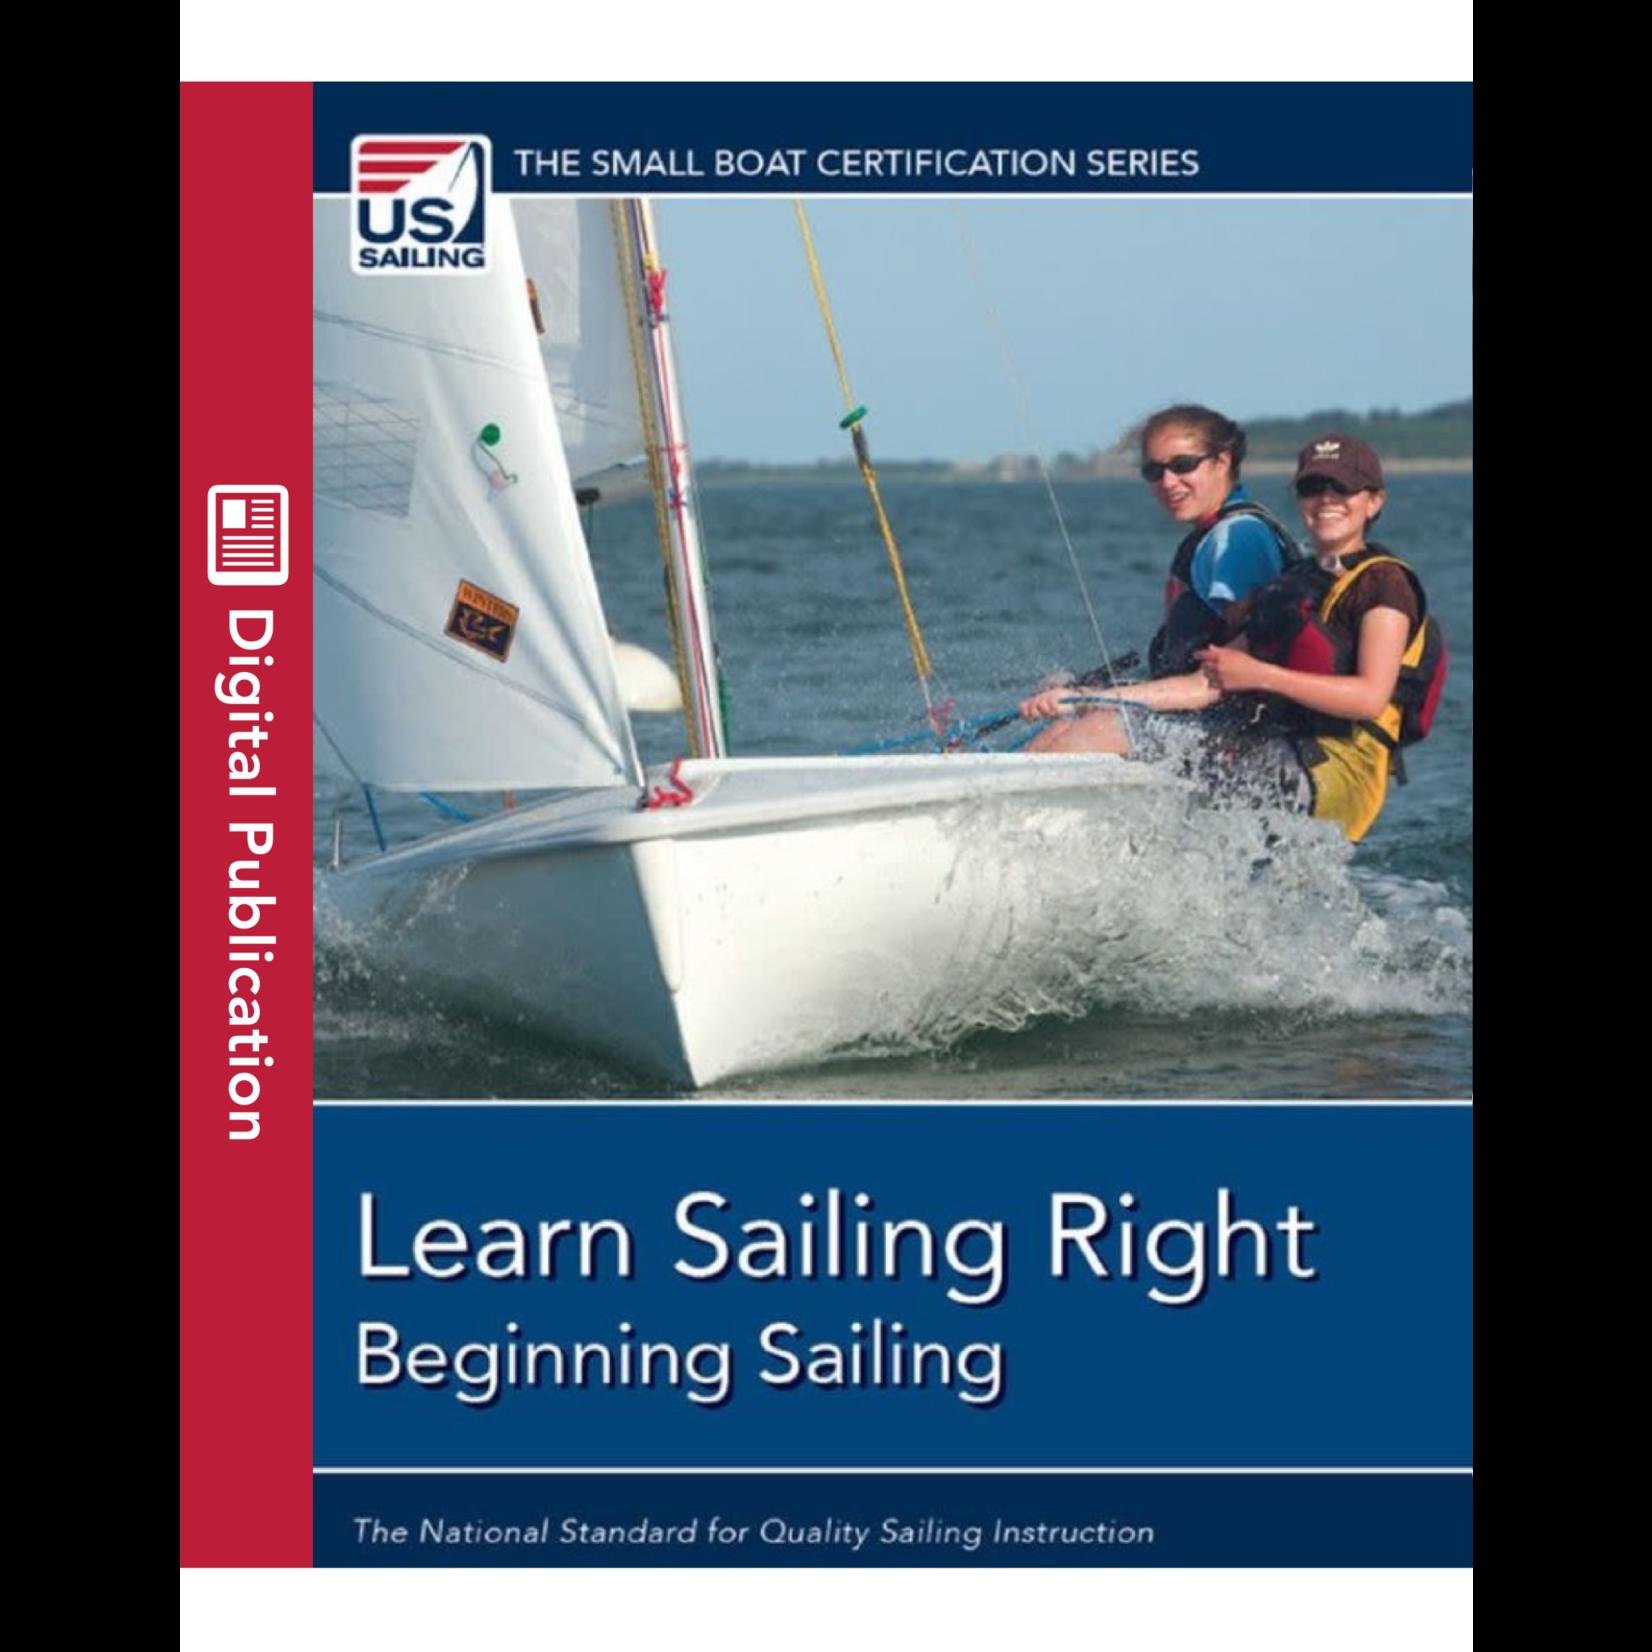 Learn Sailing Right- Beginner Digital Textbook